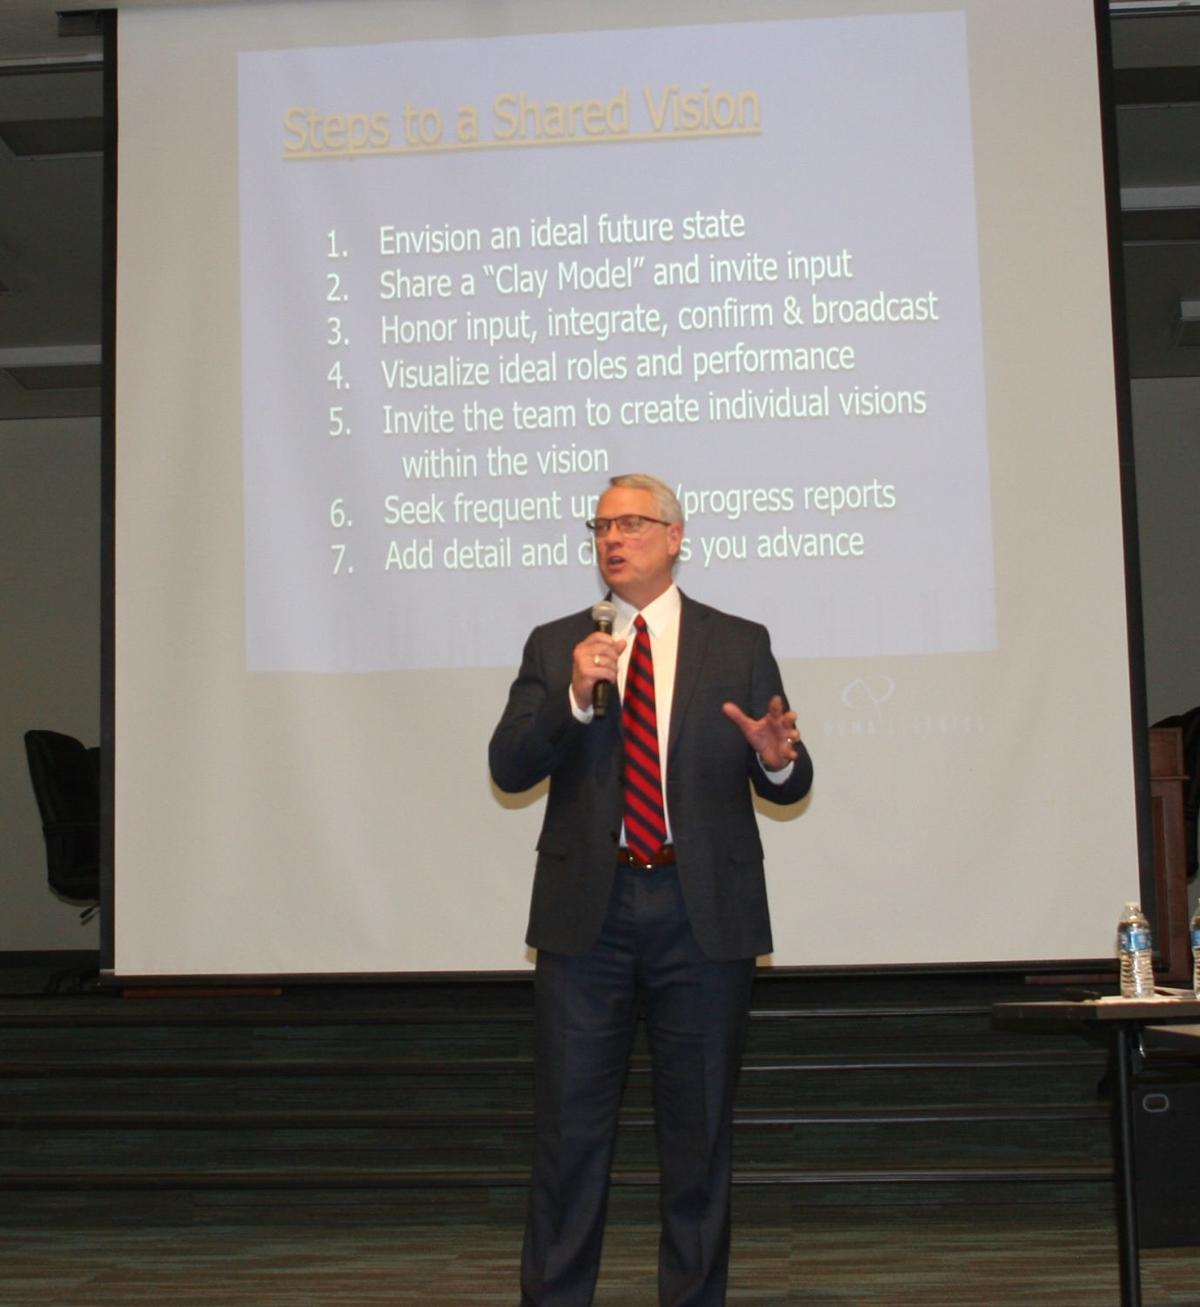 Blue Ridge USD kicks off 'Vision 2020' meeting - Dr. Wright